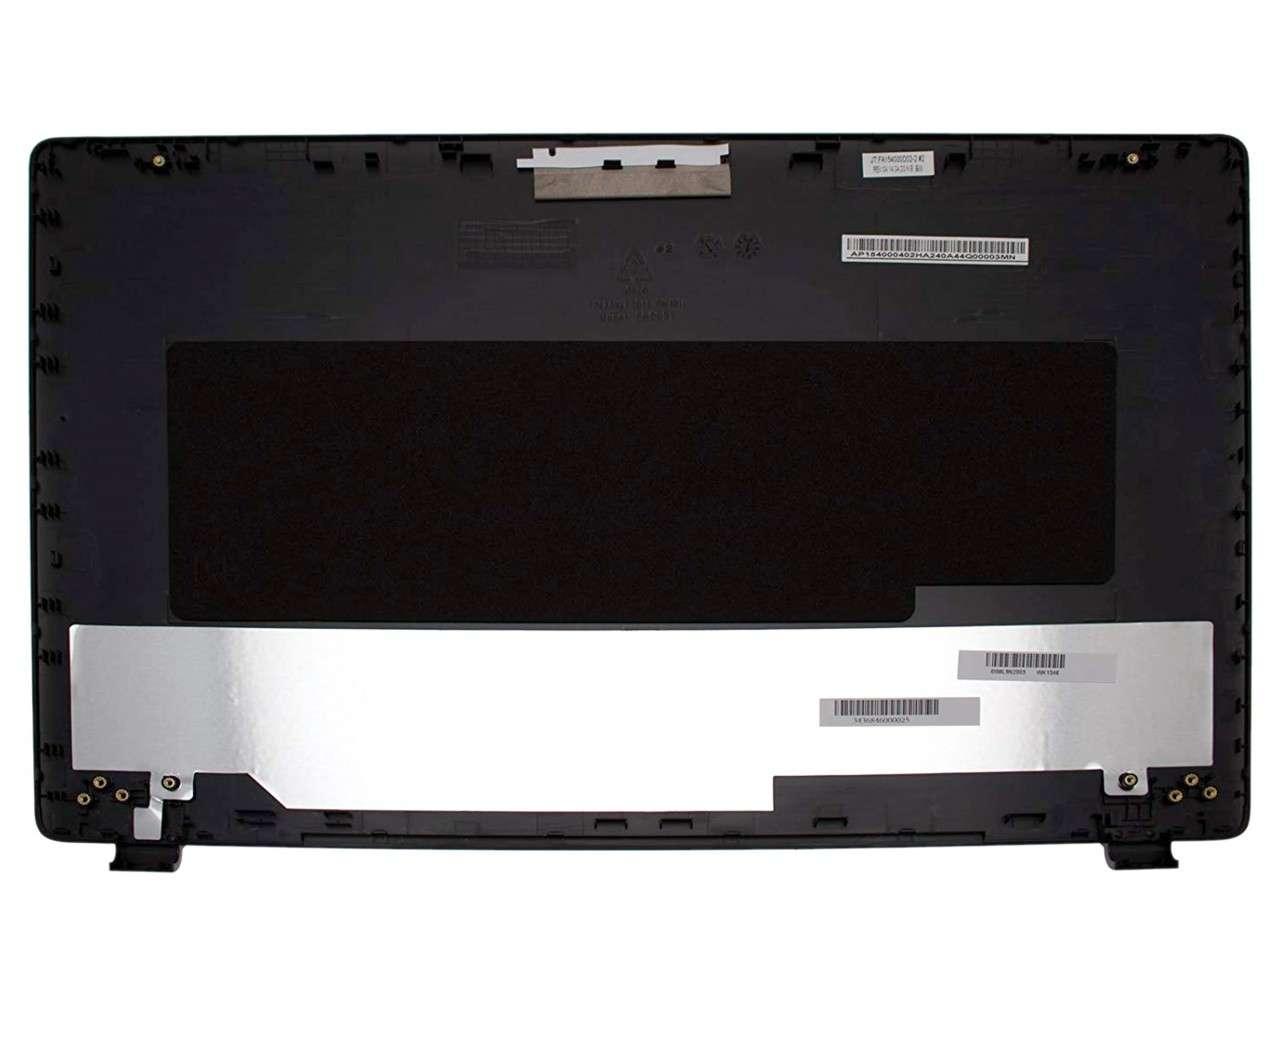 Capac Display BackCover Acer Aspire E5 572G Carcasa Display Neagra imagine